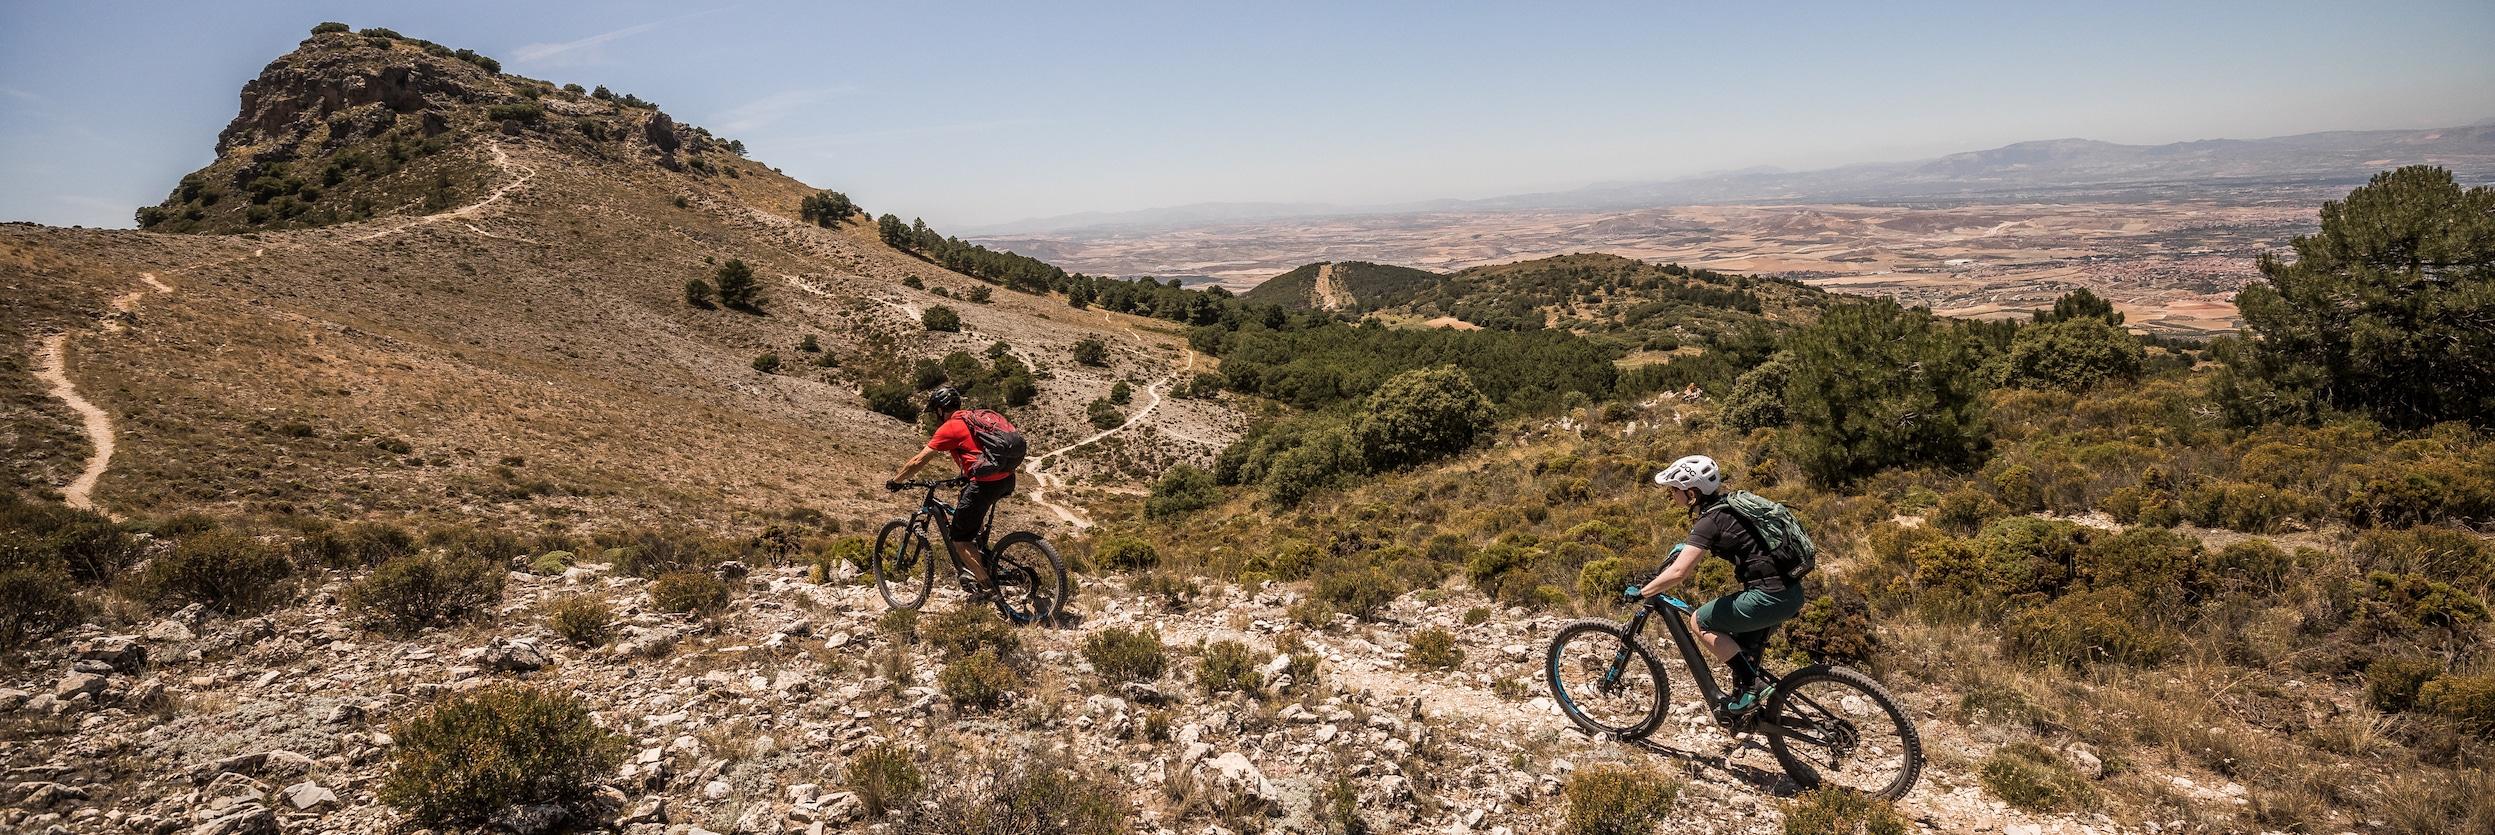 Mountain bike tours worldwide, E-MTB tour Spain